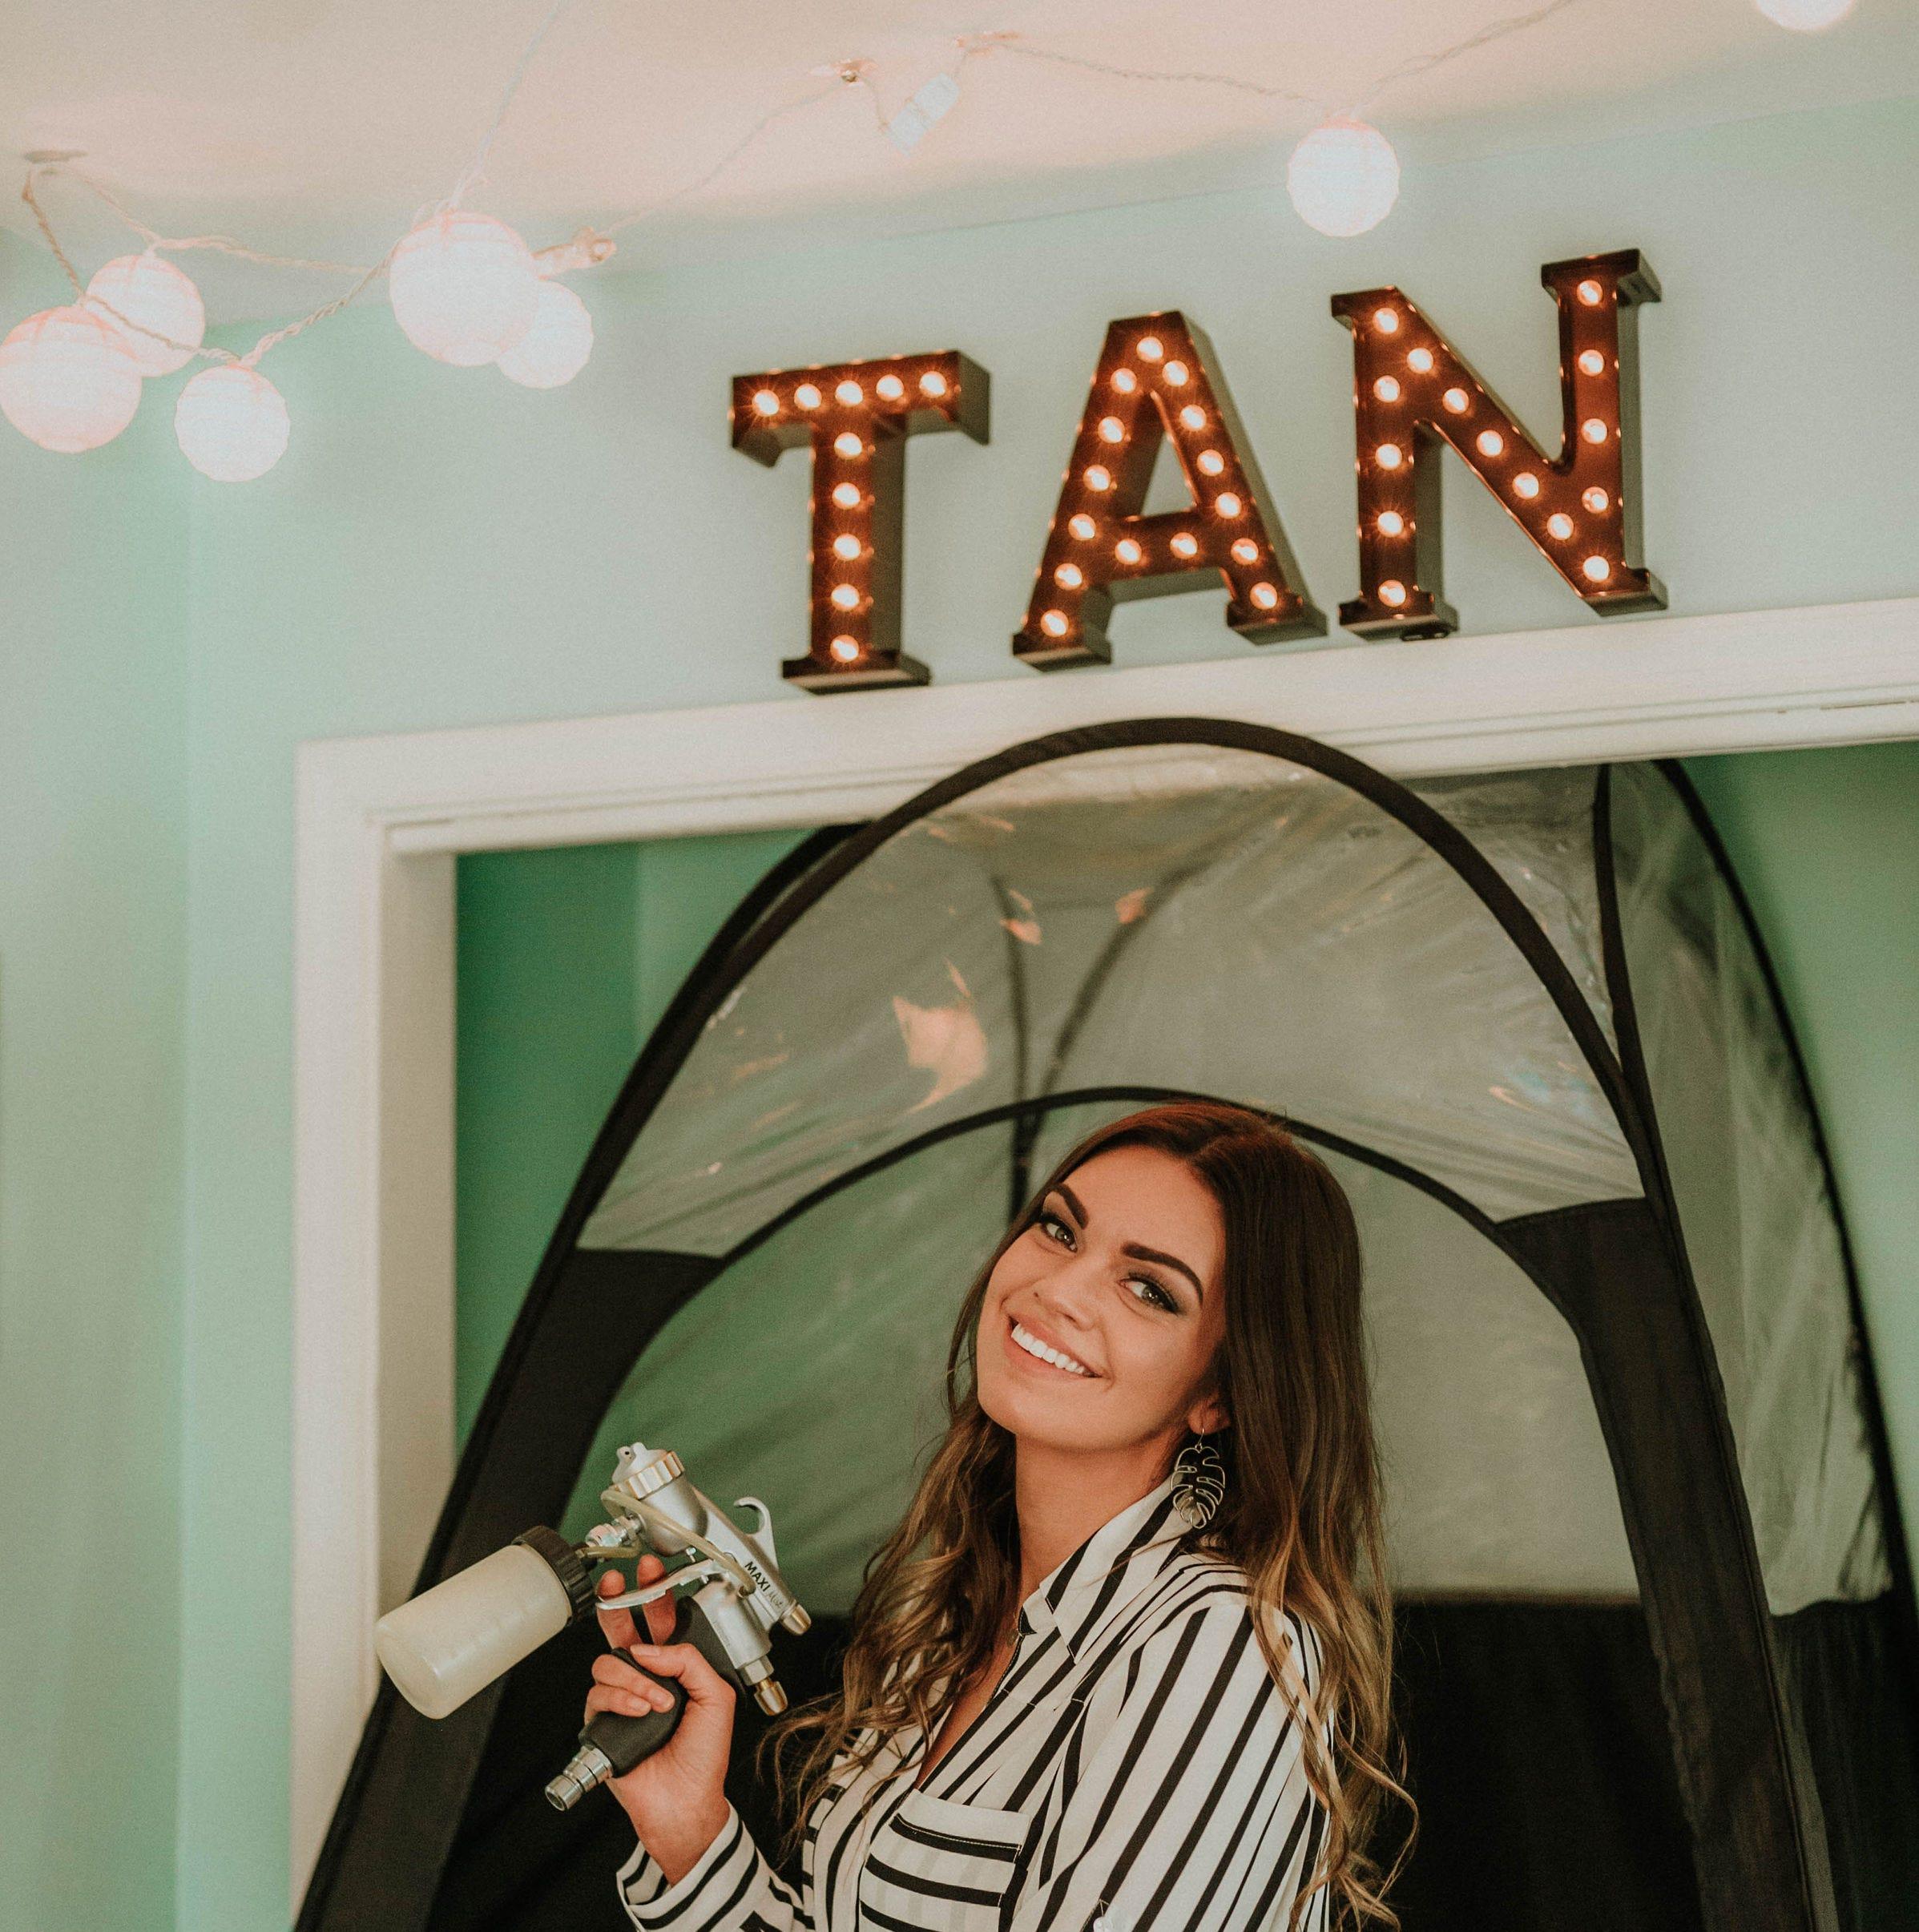 Sunless tanning studio opening downtown Salisbury store